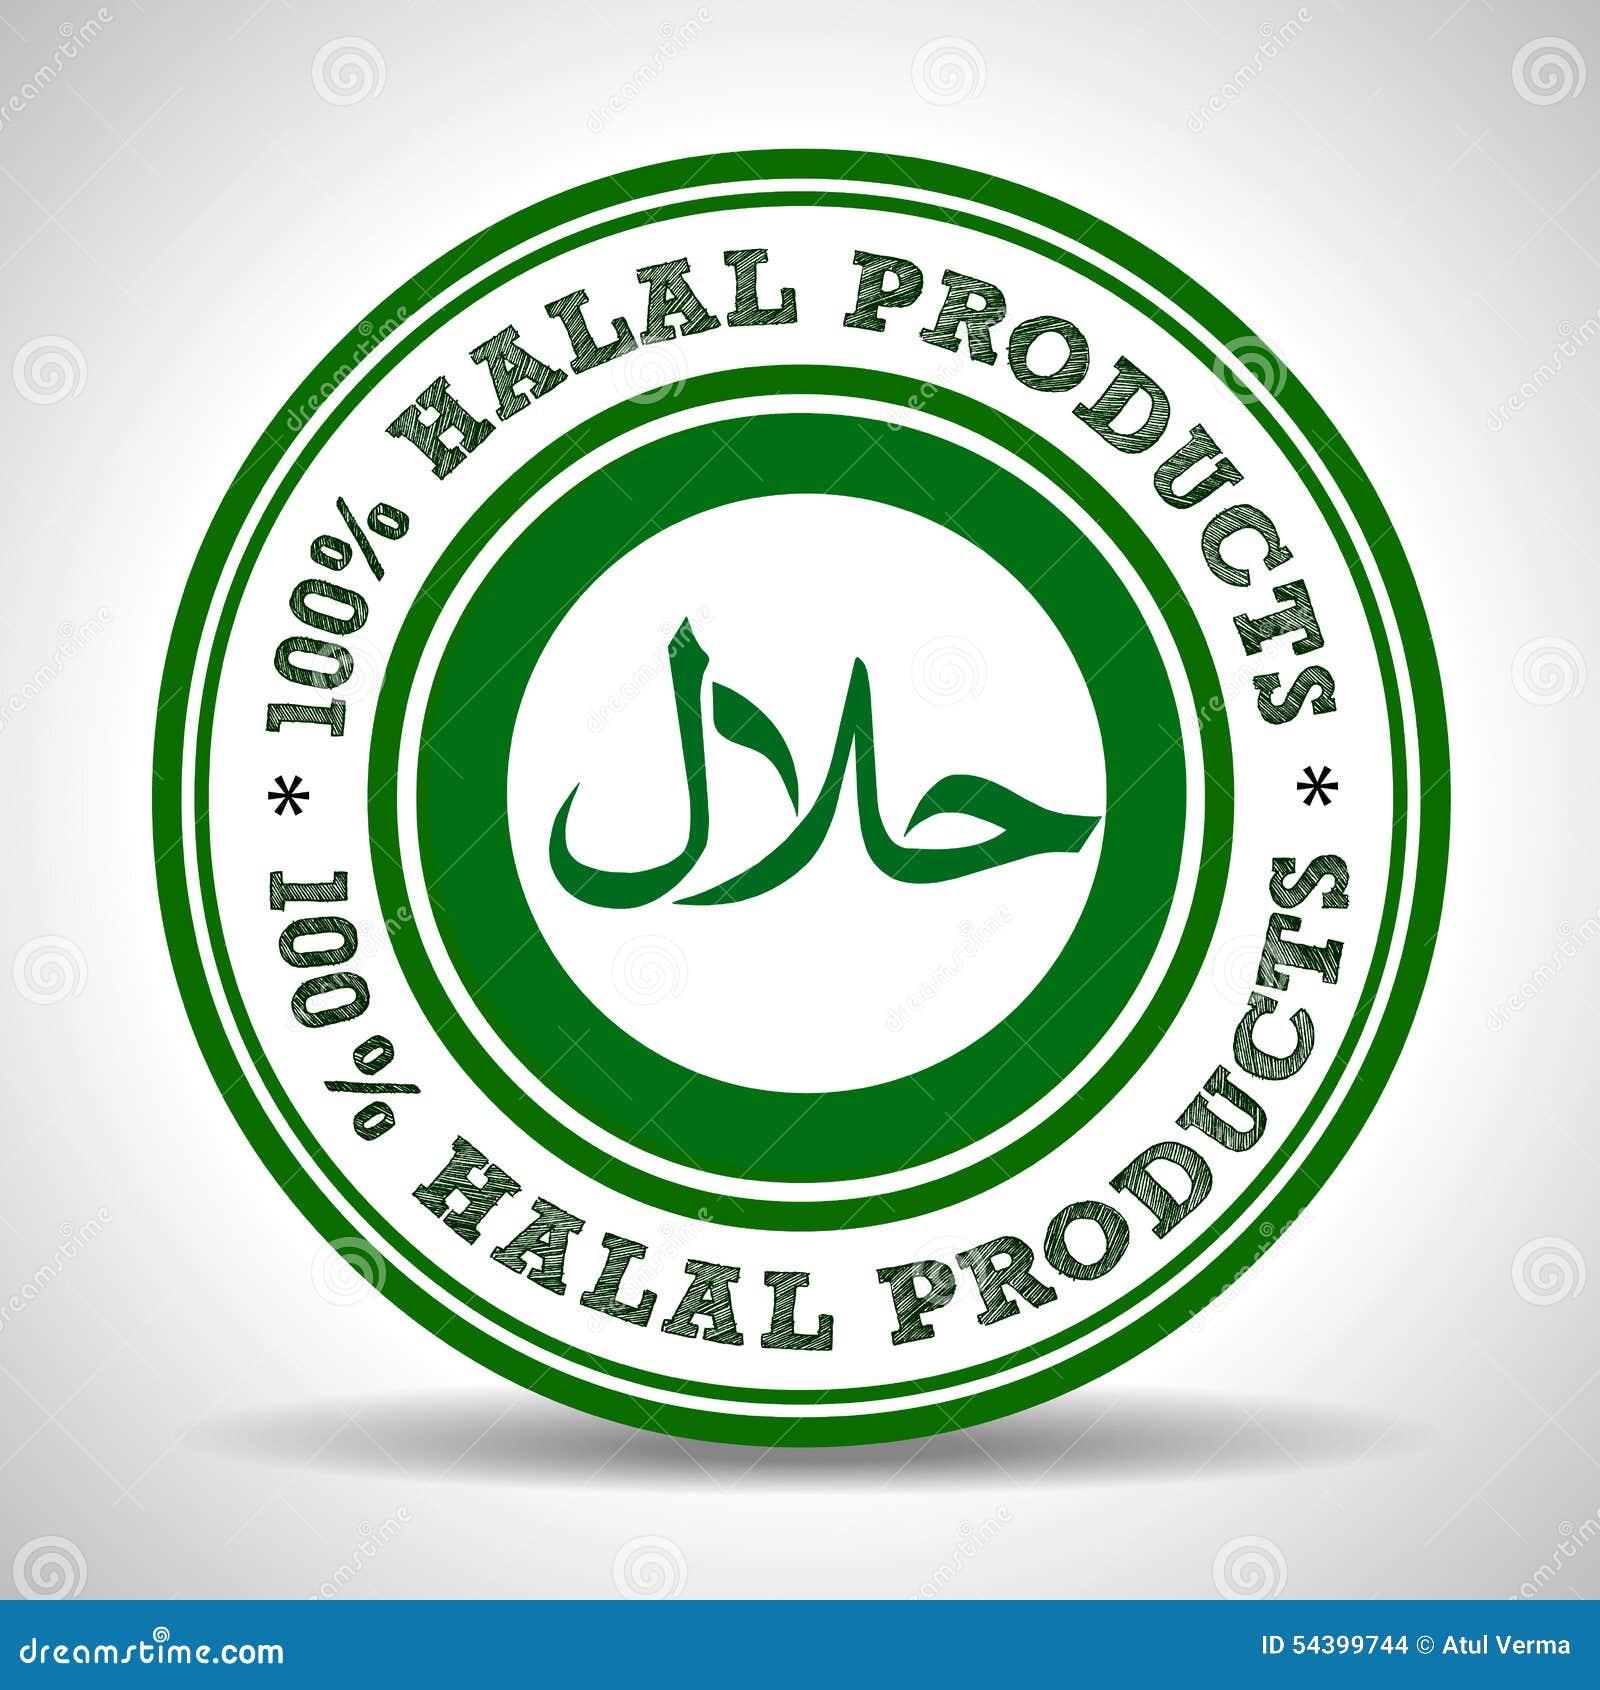 100 halal product green label certified halal food seal stock 100 halal product green label certified halal food seal buycottarizona